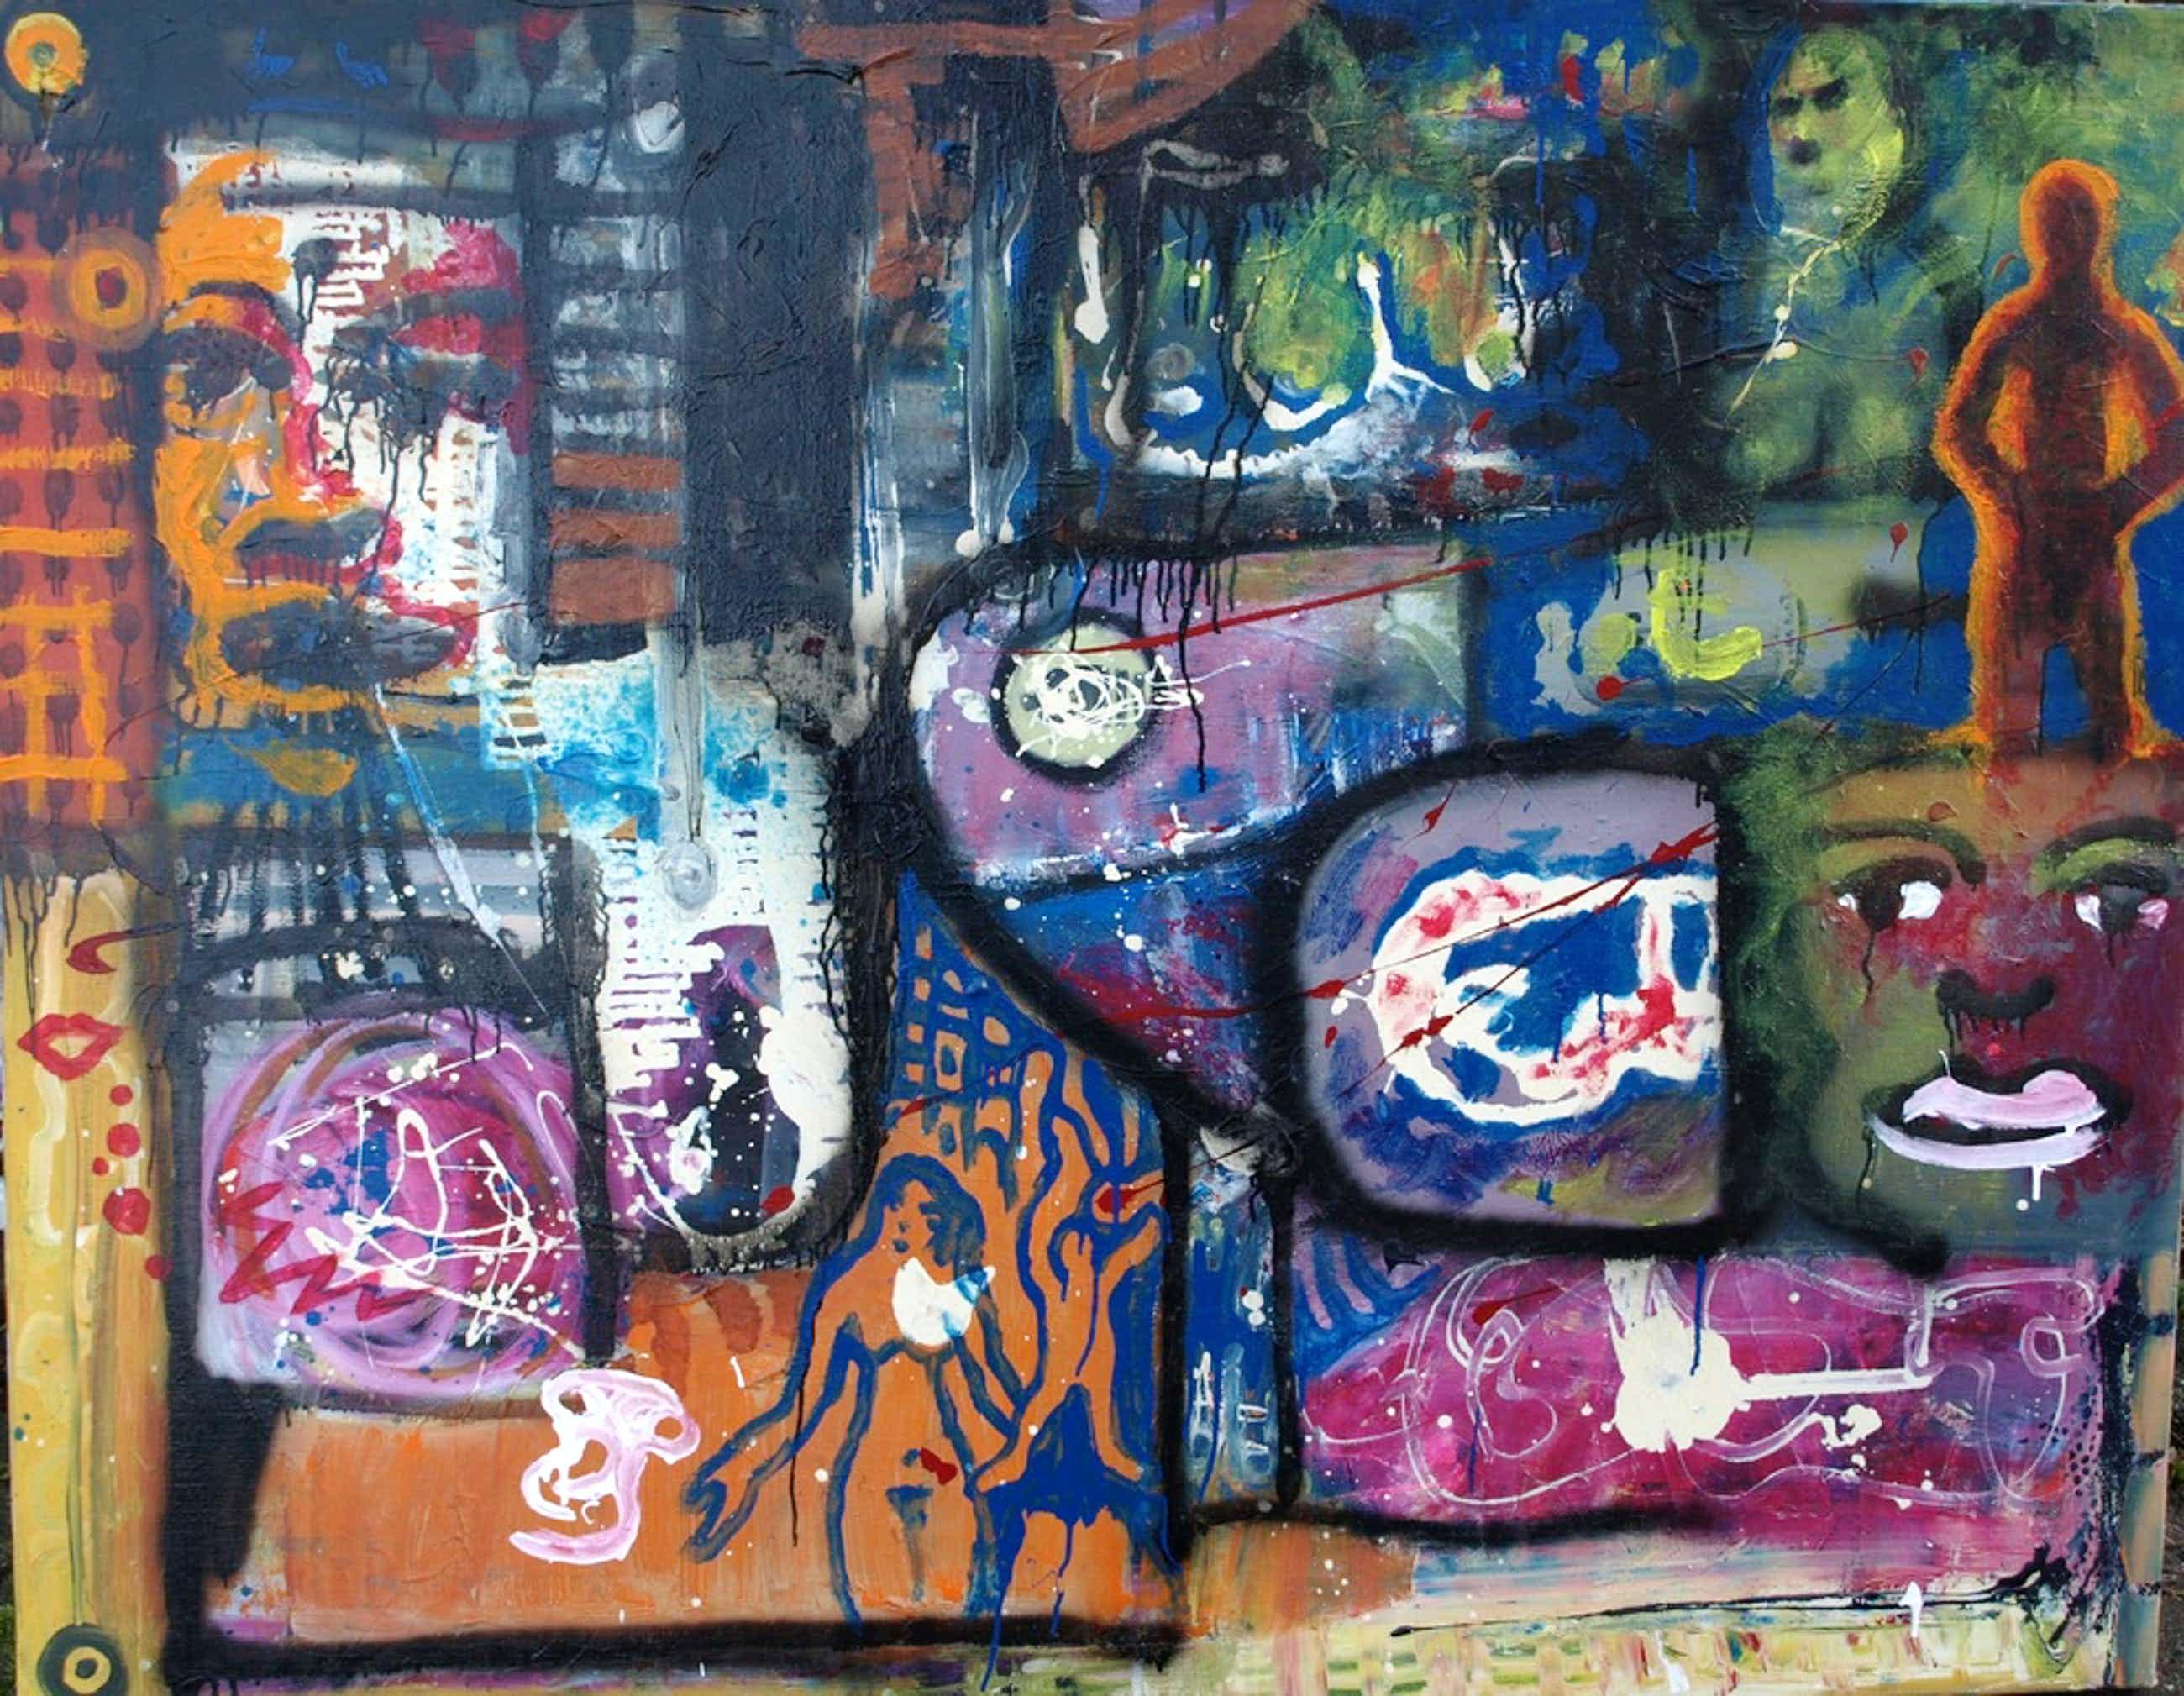 Justus Donker : Olieverf op doek � Street Art - 135 x 170 cm - ca 2000 kopen? Bied vanaf 100!